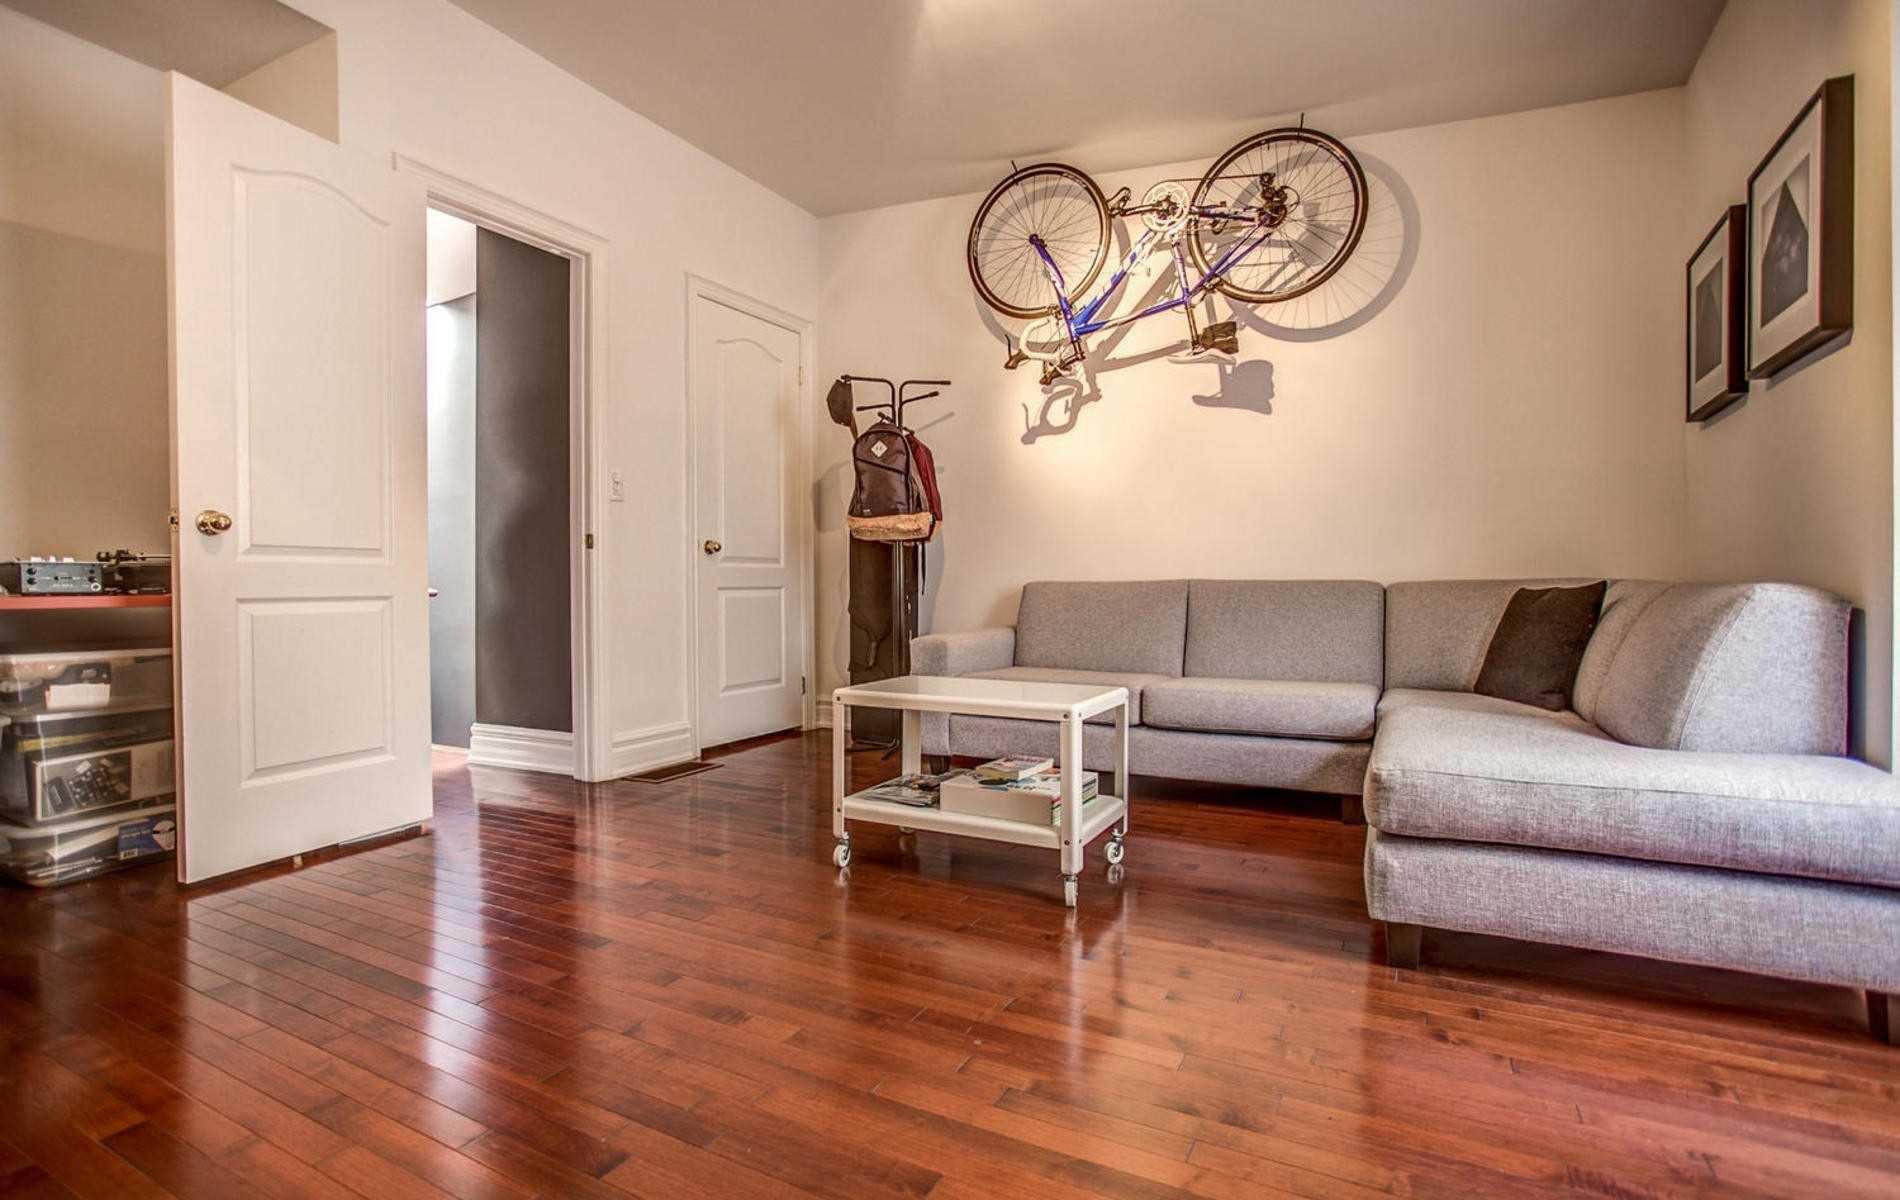 Photo 14: Photos: 119 Carlaw Avenue in Toronto: South Riverdale House (3-Storey) for lease (Toronto E01)  : MLS®# E4386176